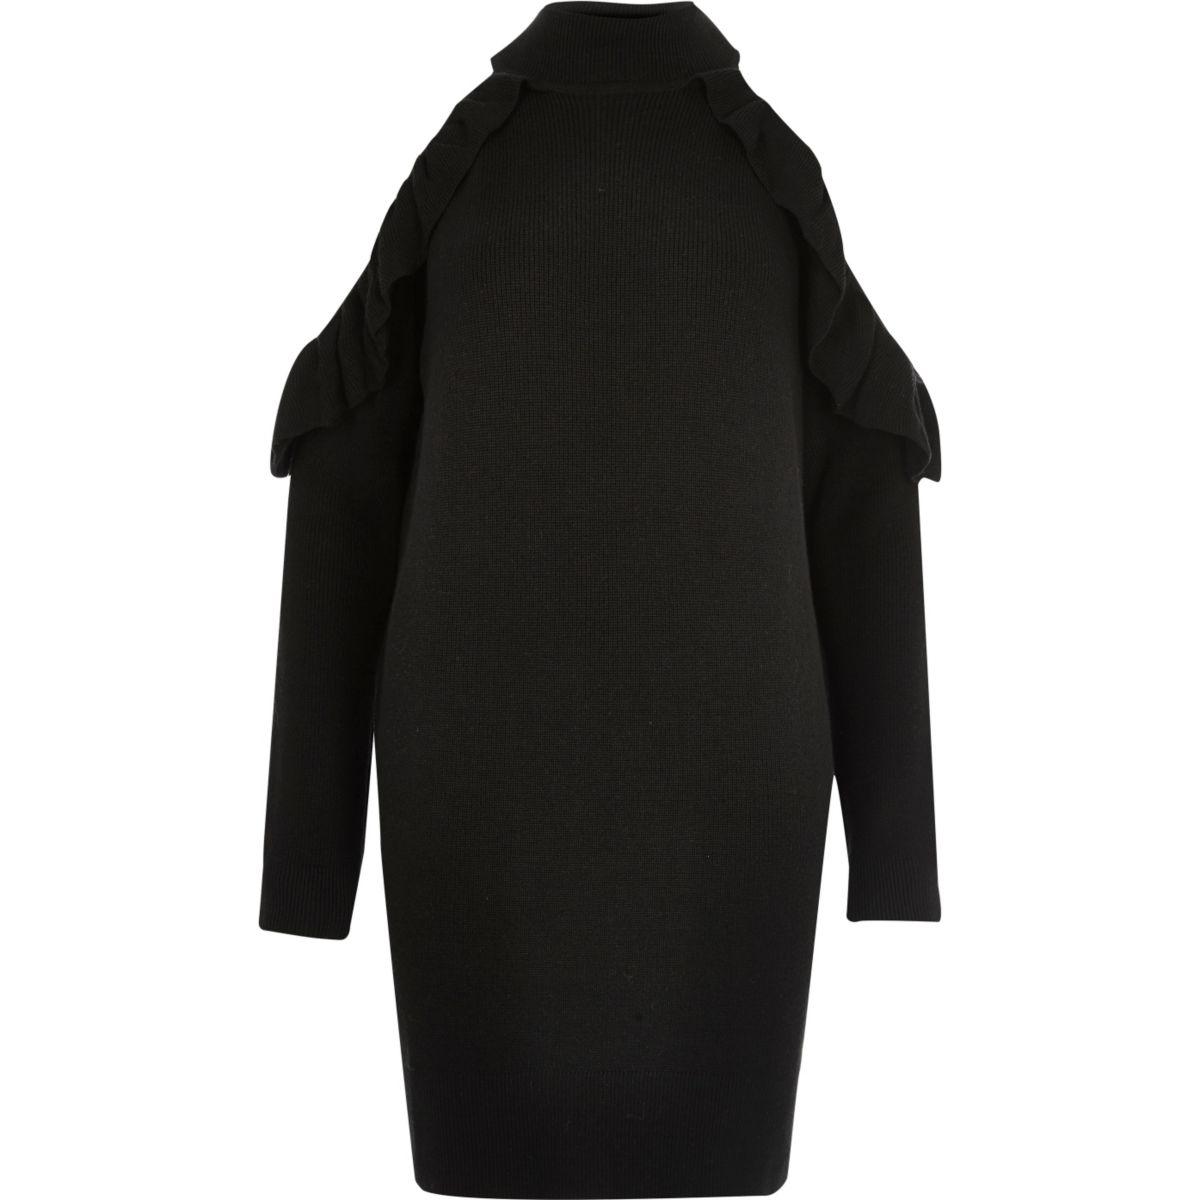 Zwarte gebreide schouderloze trui-jurk met ruches